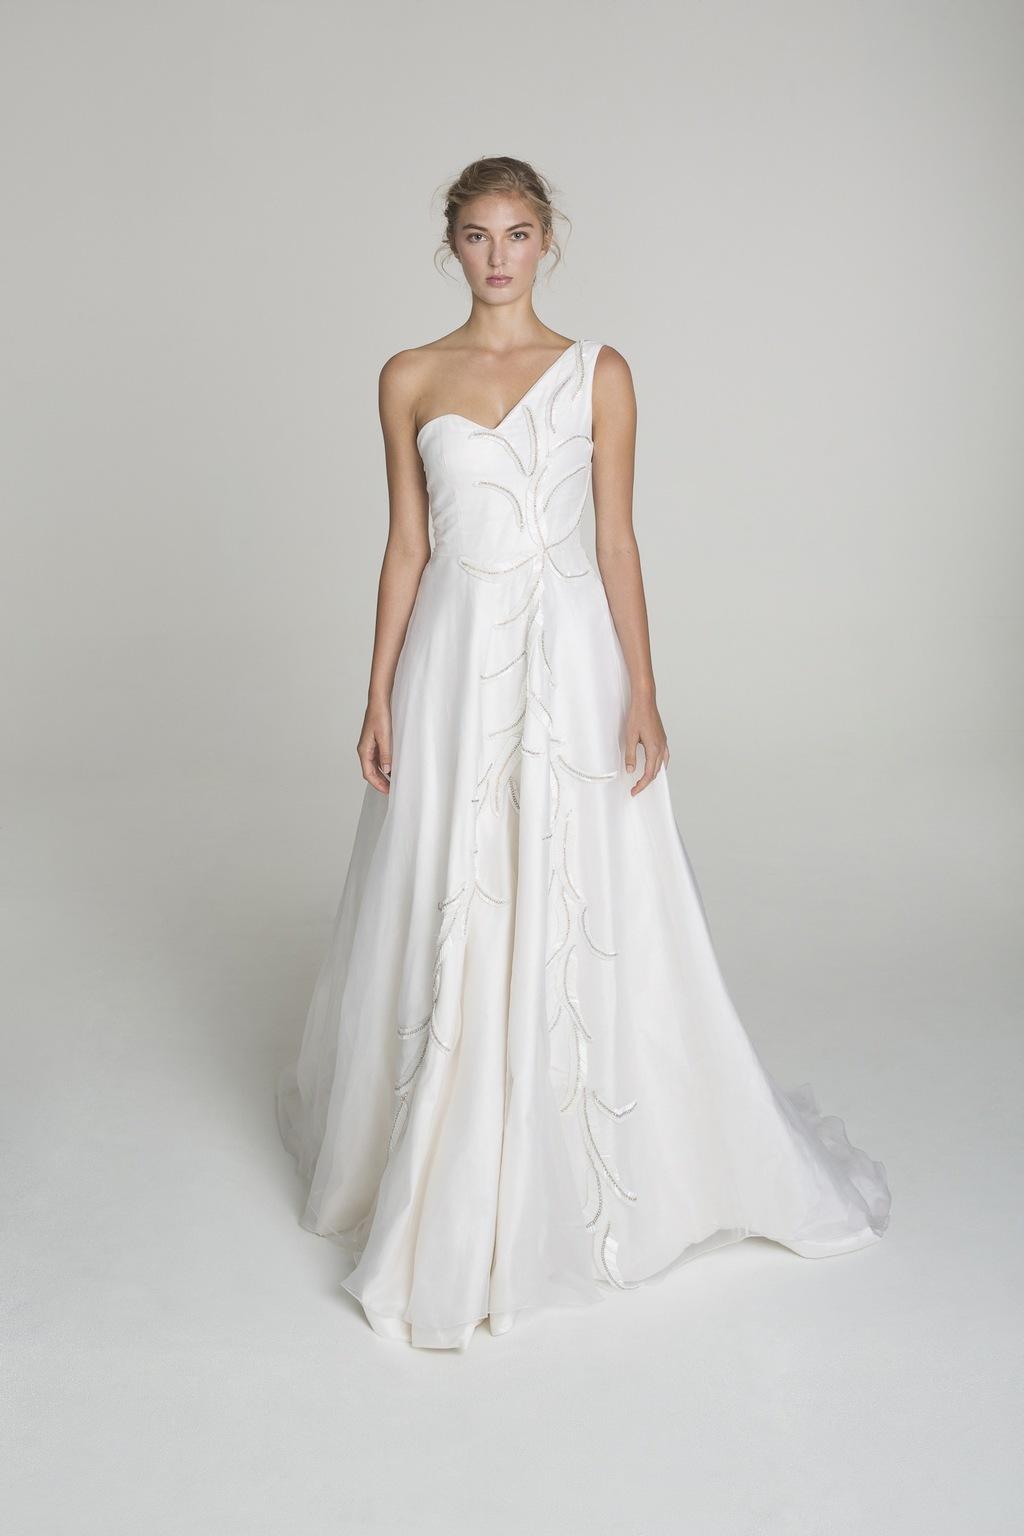 One_shoulder_wedding_dress_from_alana_aoun.full